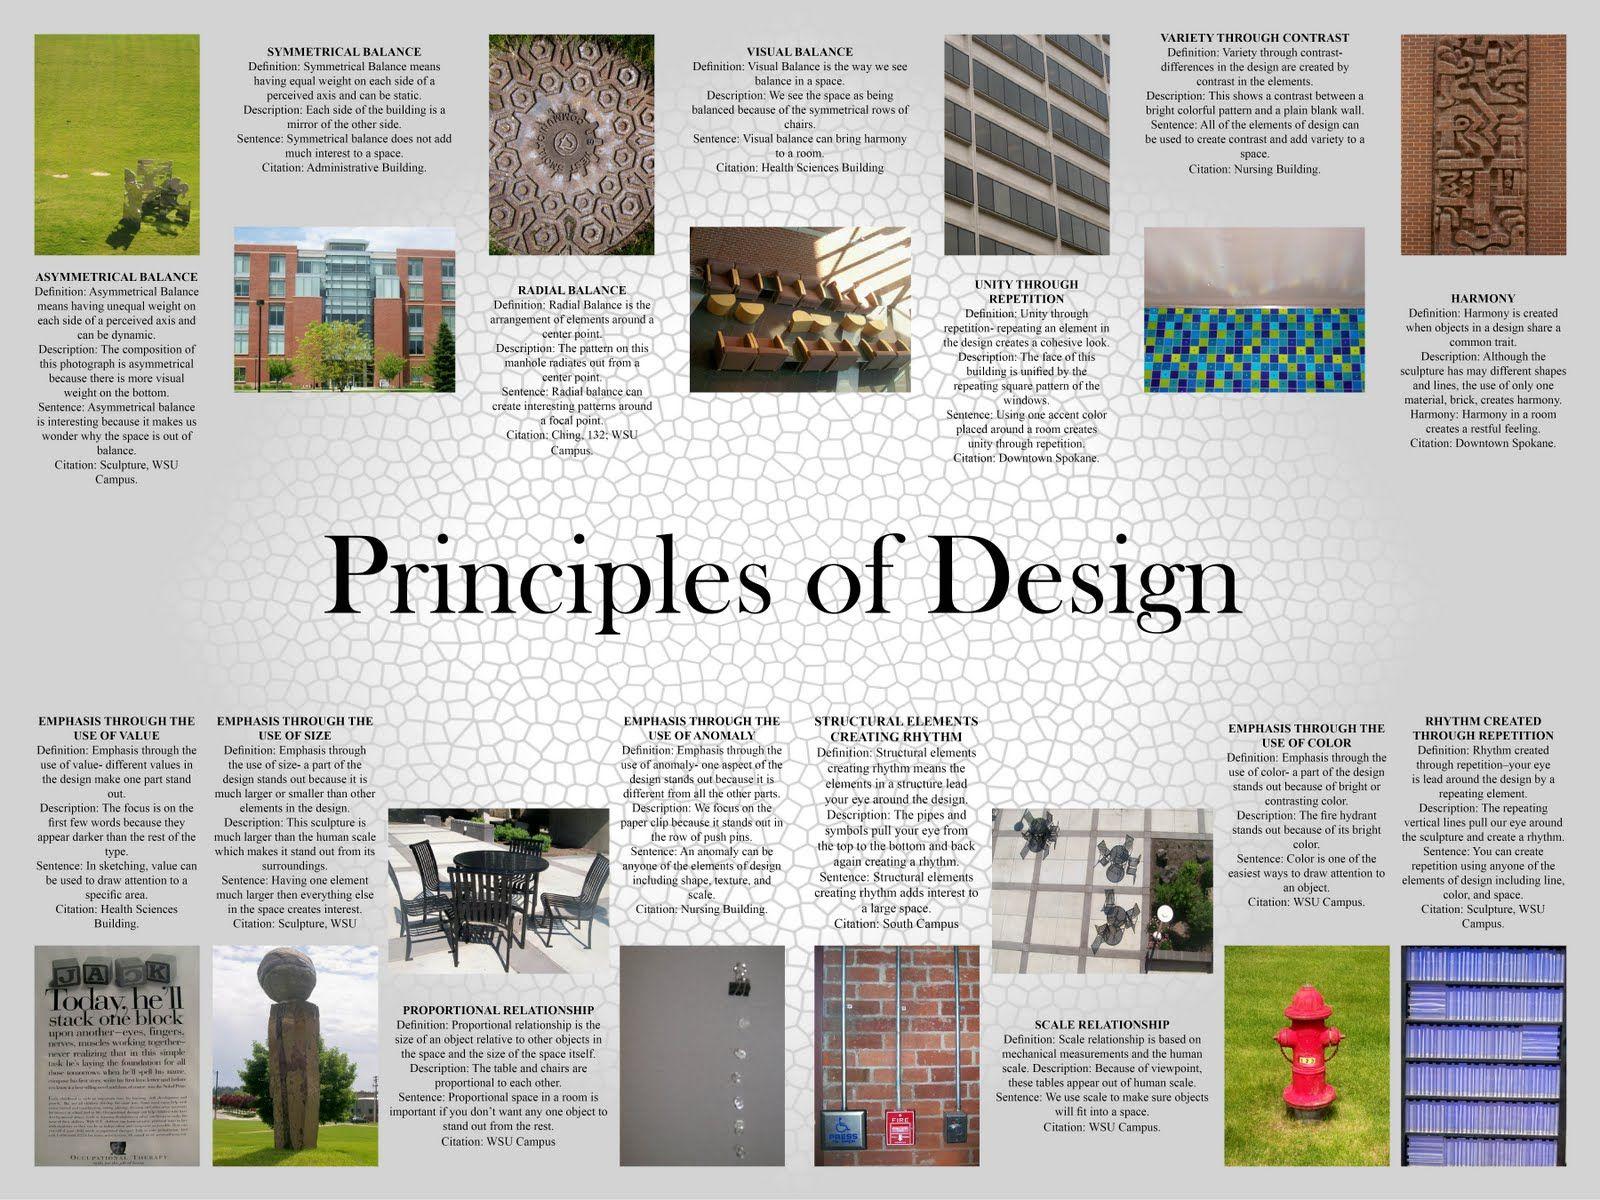 Architecture Design Elements architecture design, interior design elements school garage living